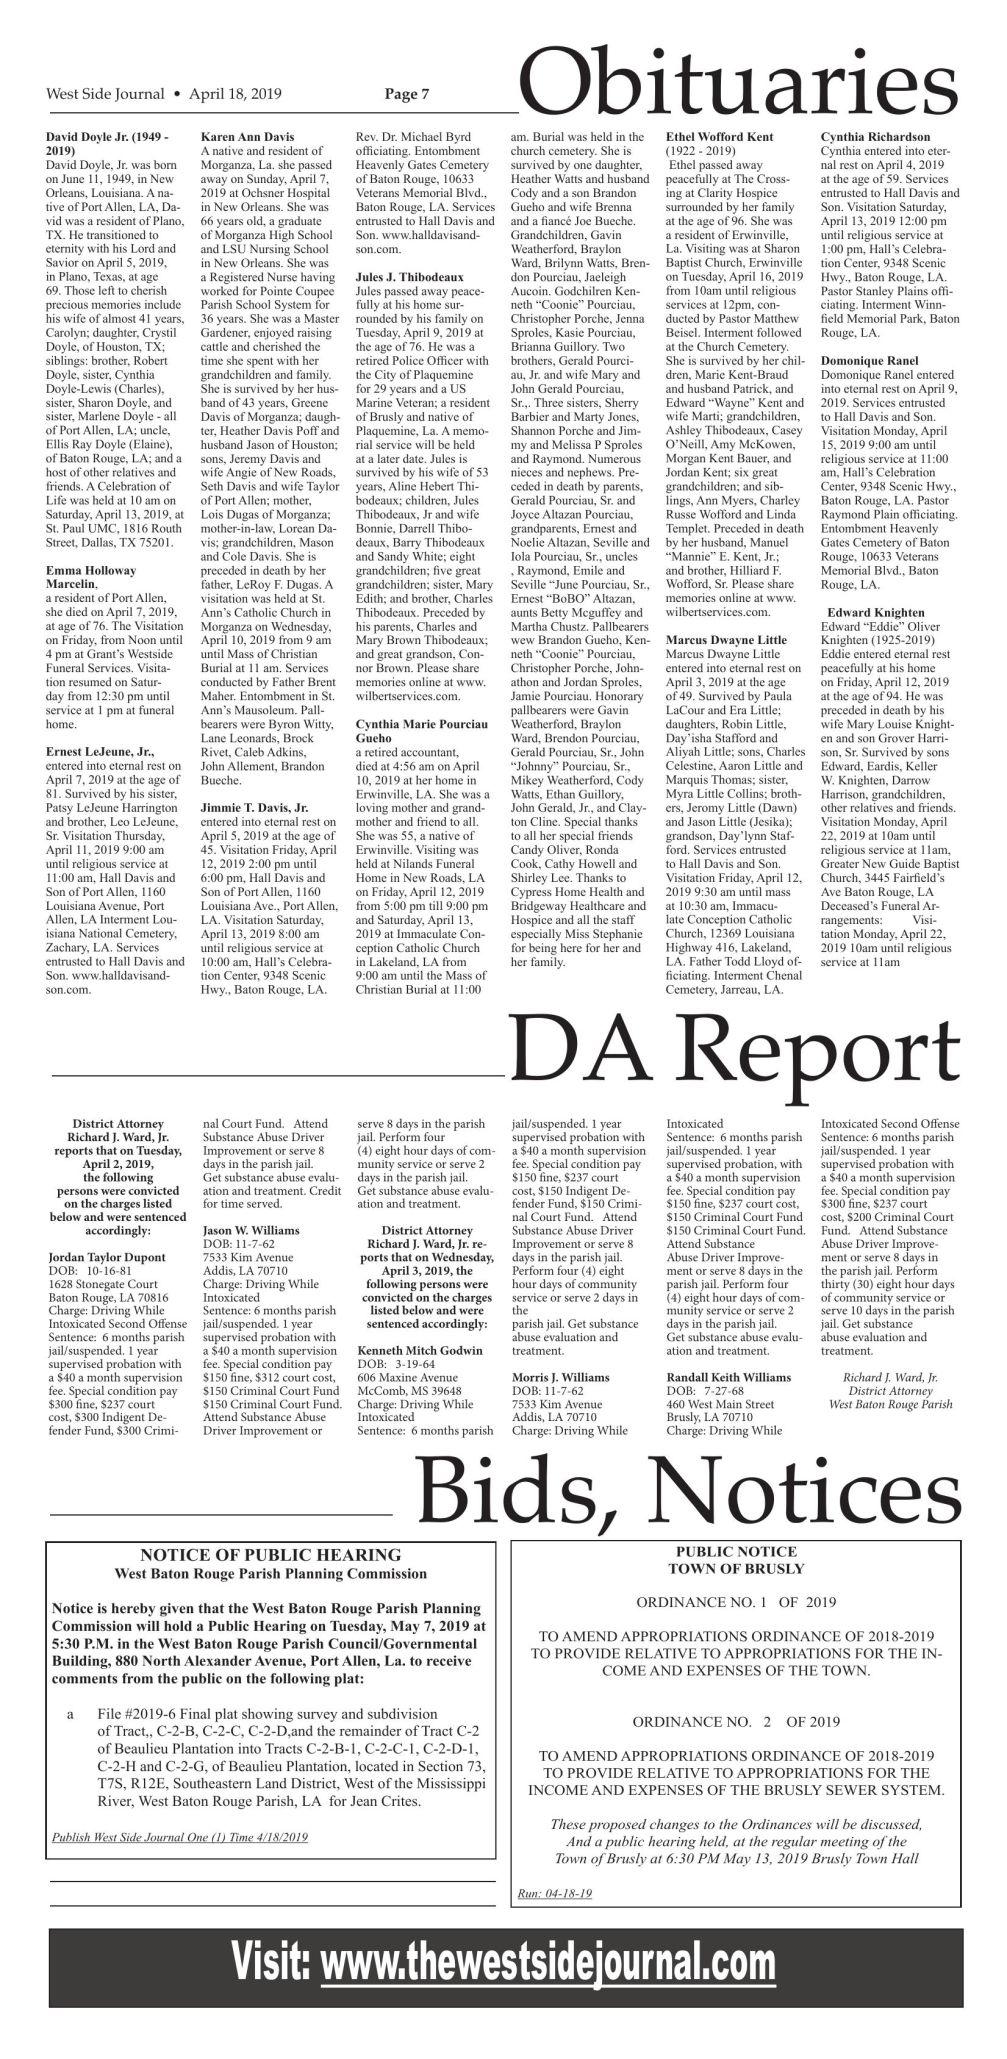 Bids & Notices 04.18.19